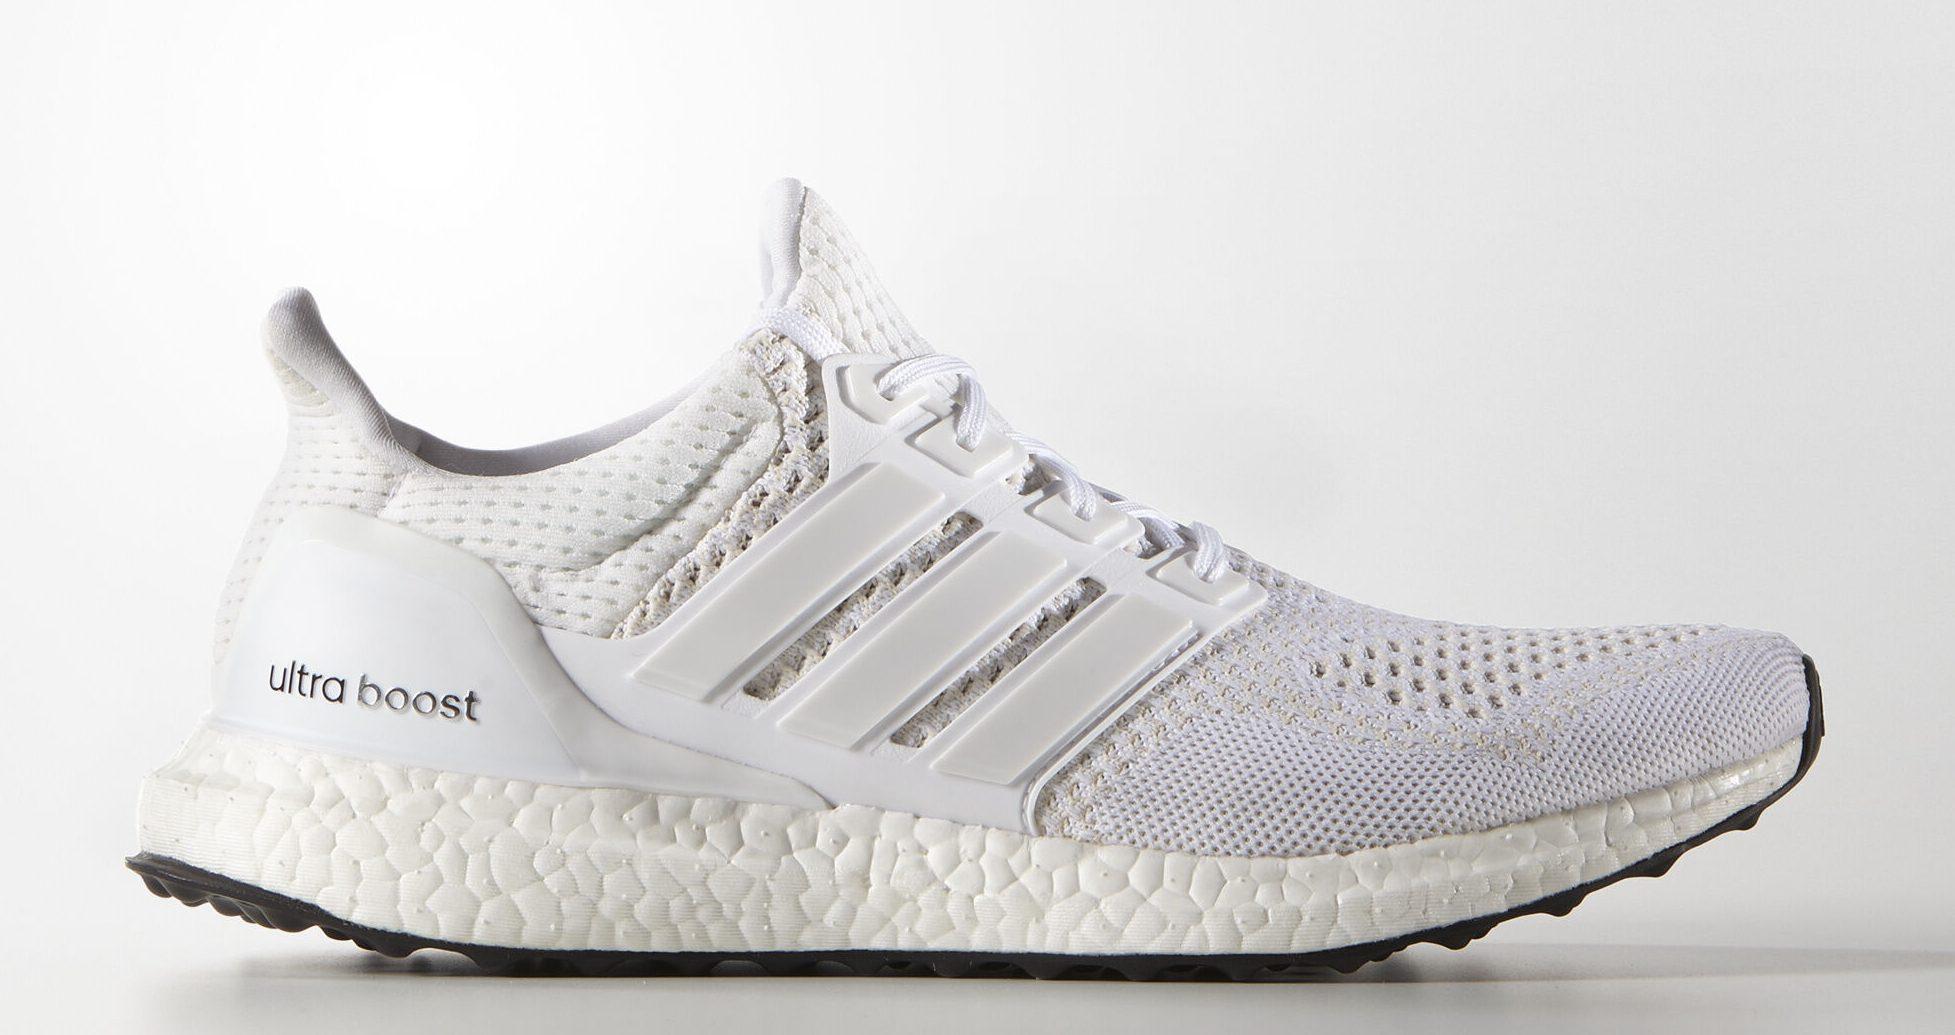 Adidas Ultra Boost 1.0 'Triple White